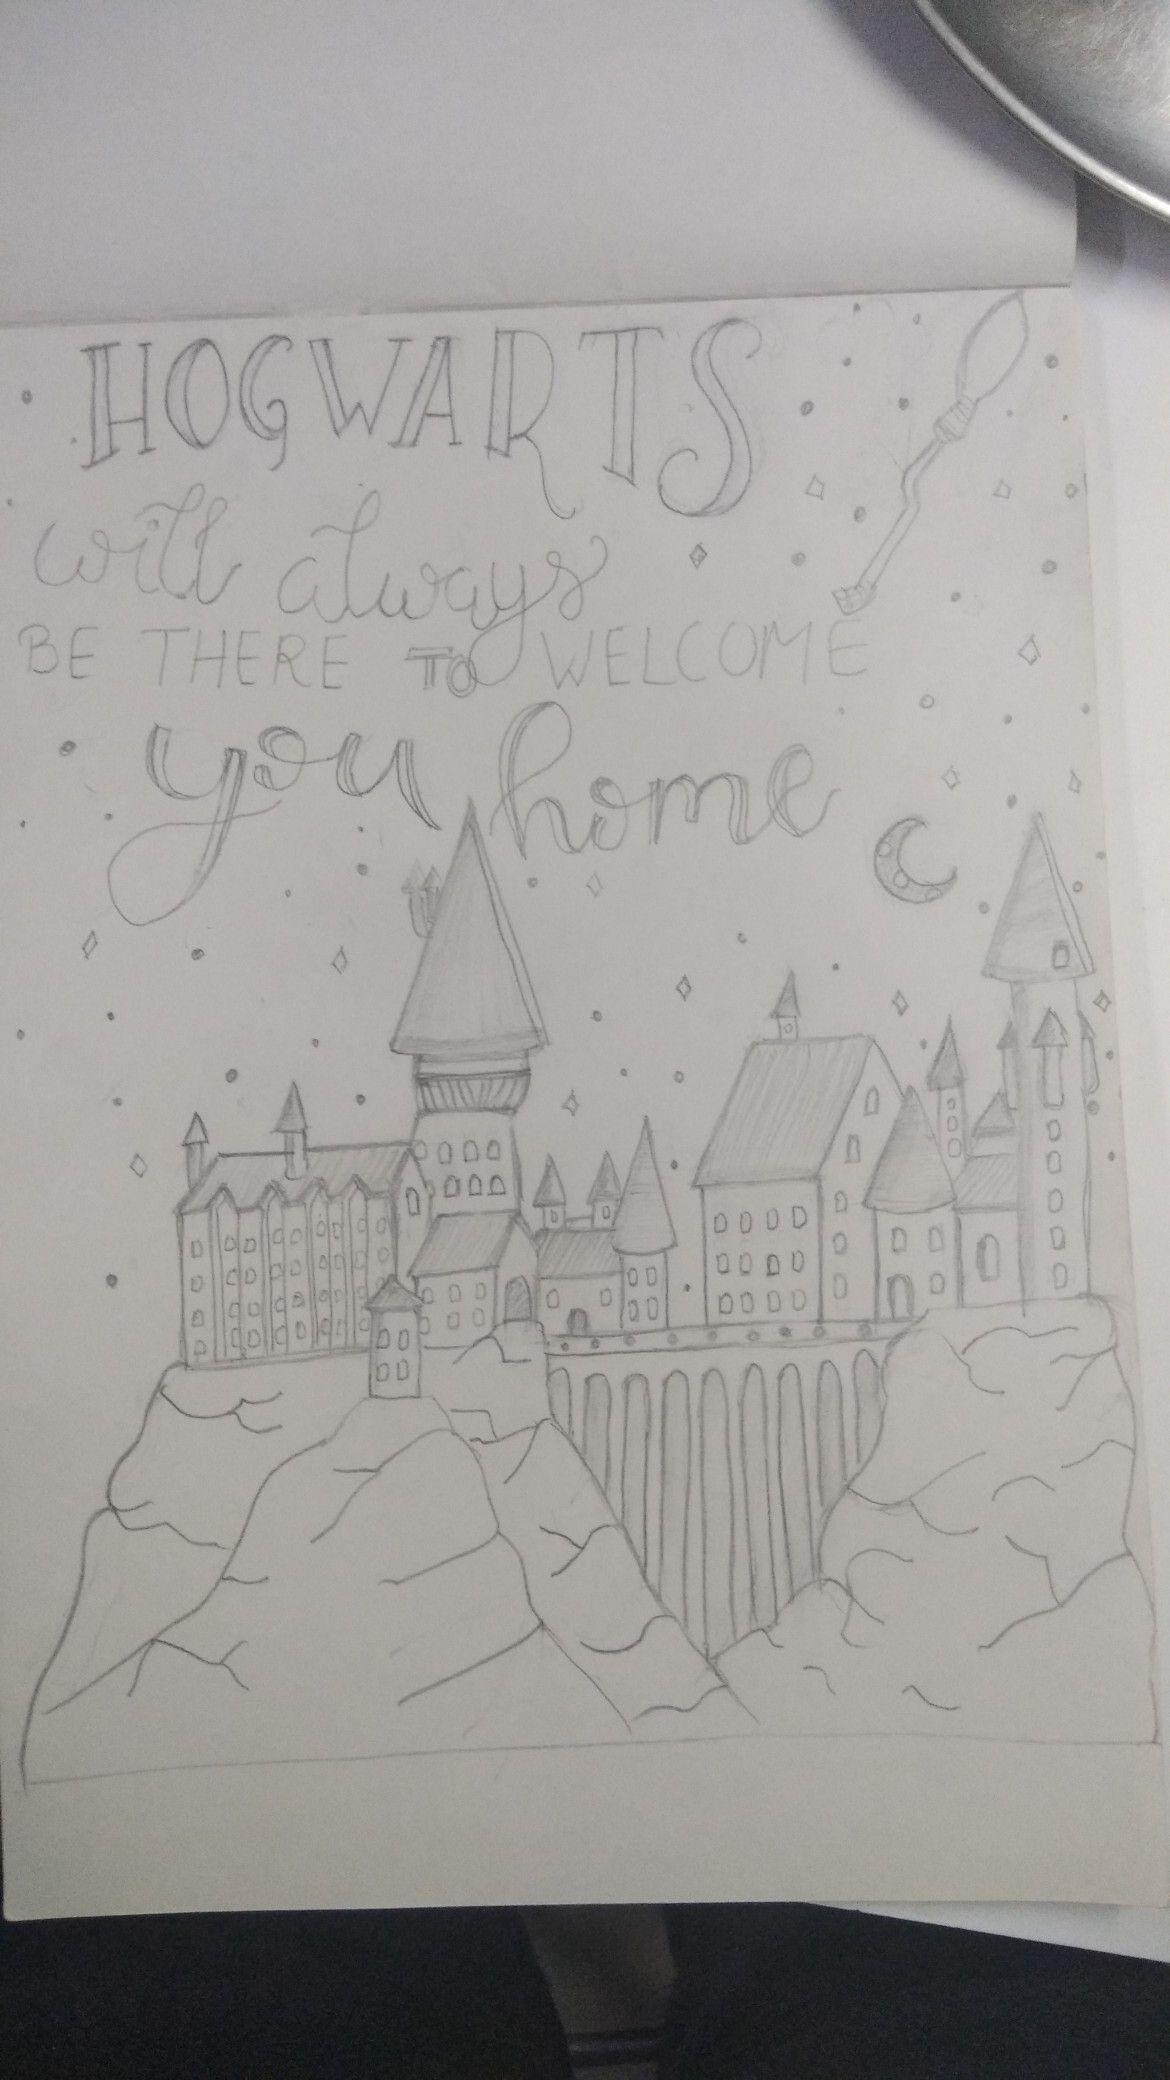 How To Draw Hogwarts Castle : hogwarts, castle, Hogwarts, Castle, Drawing,, Painting,, Sketch